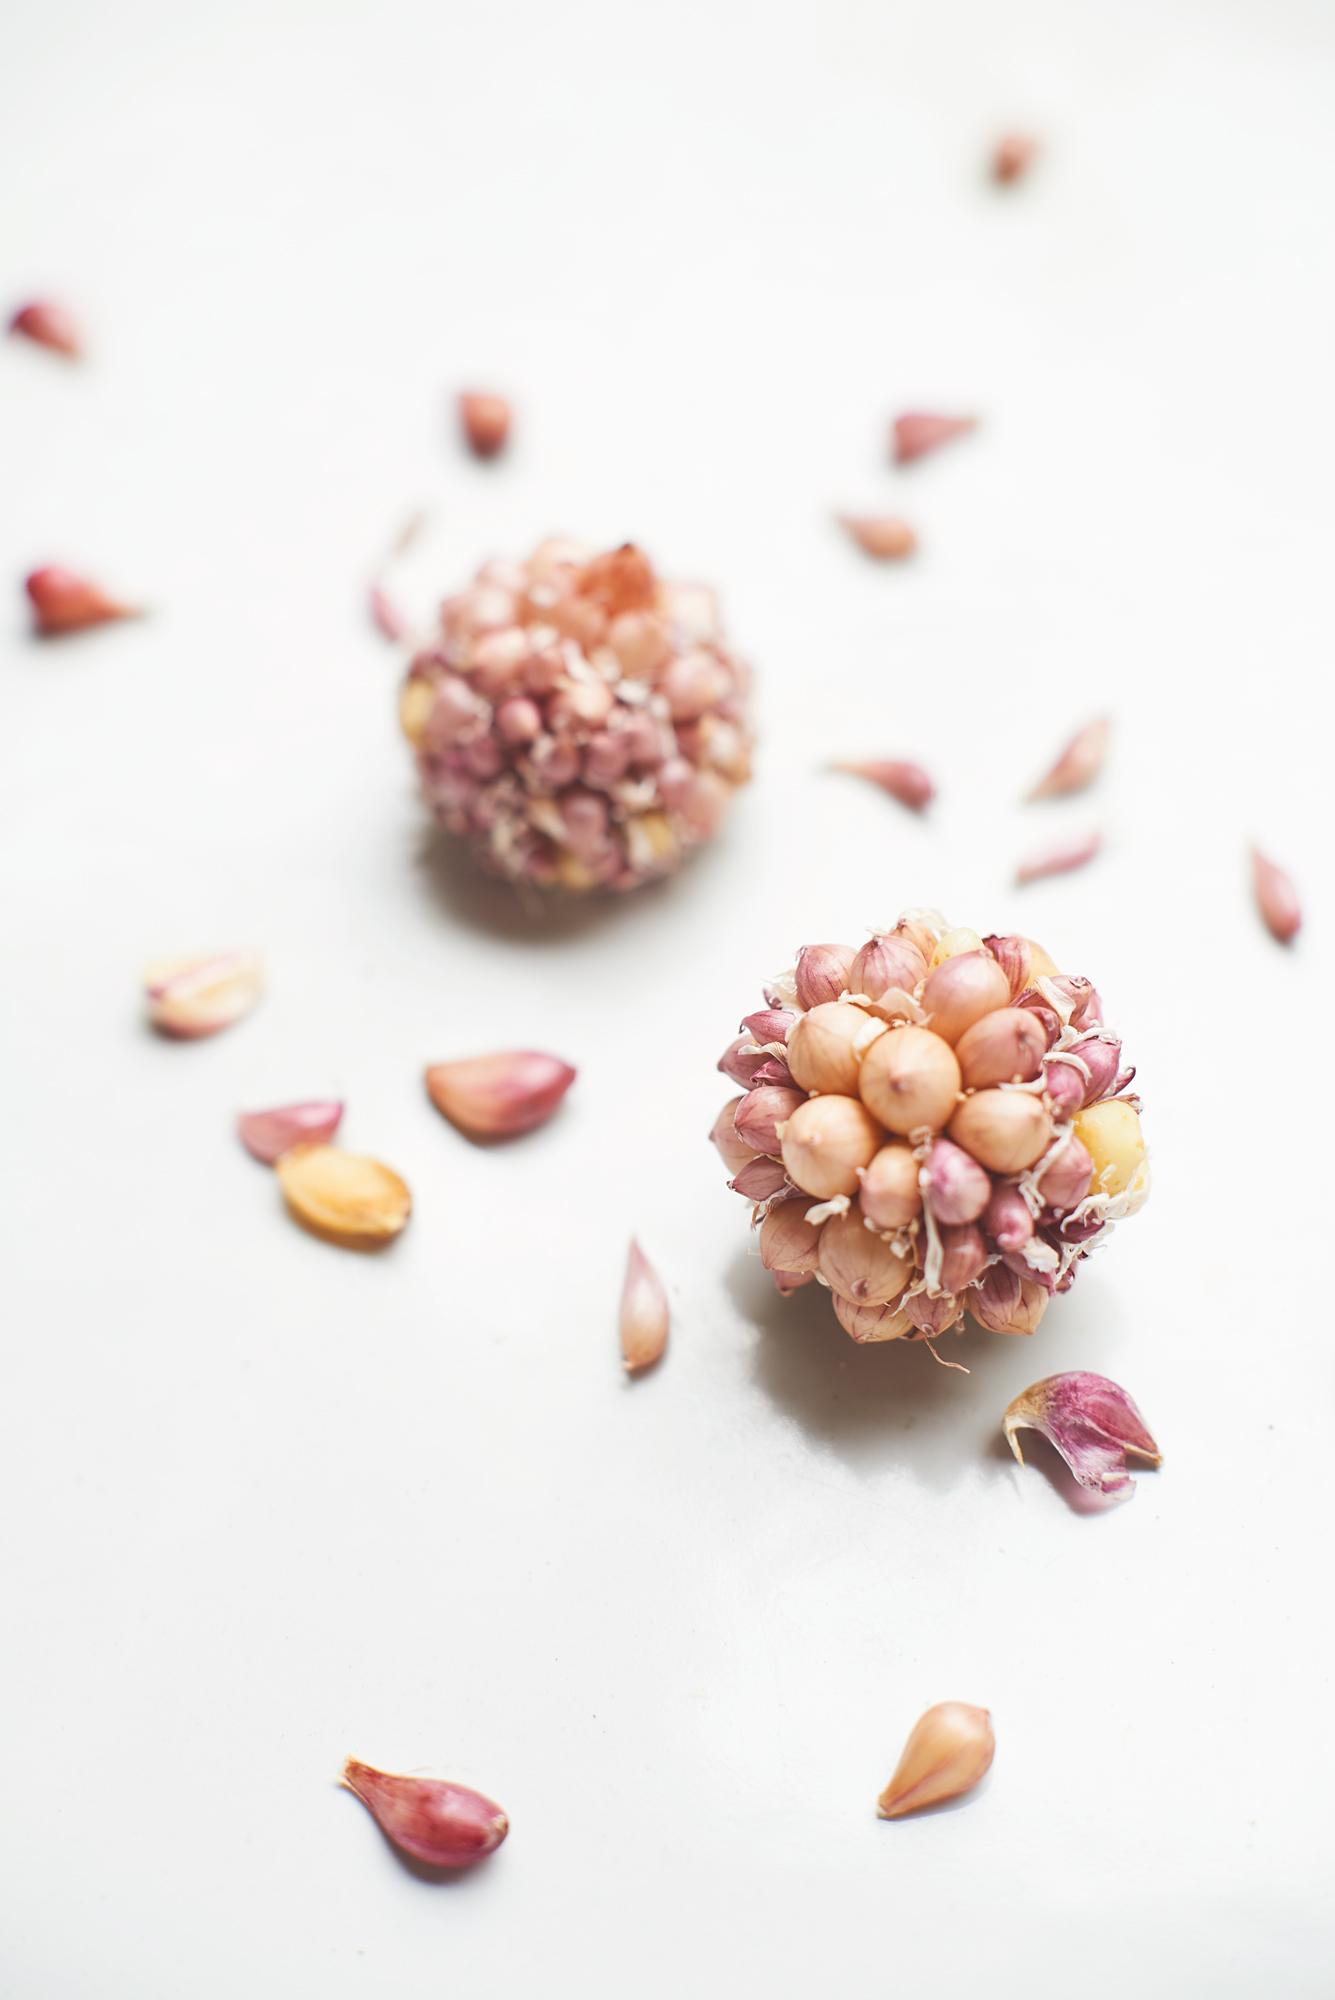 pearl-garlic.jpg